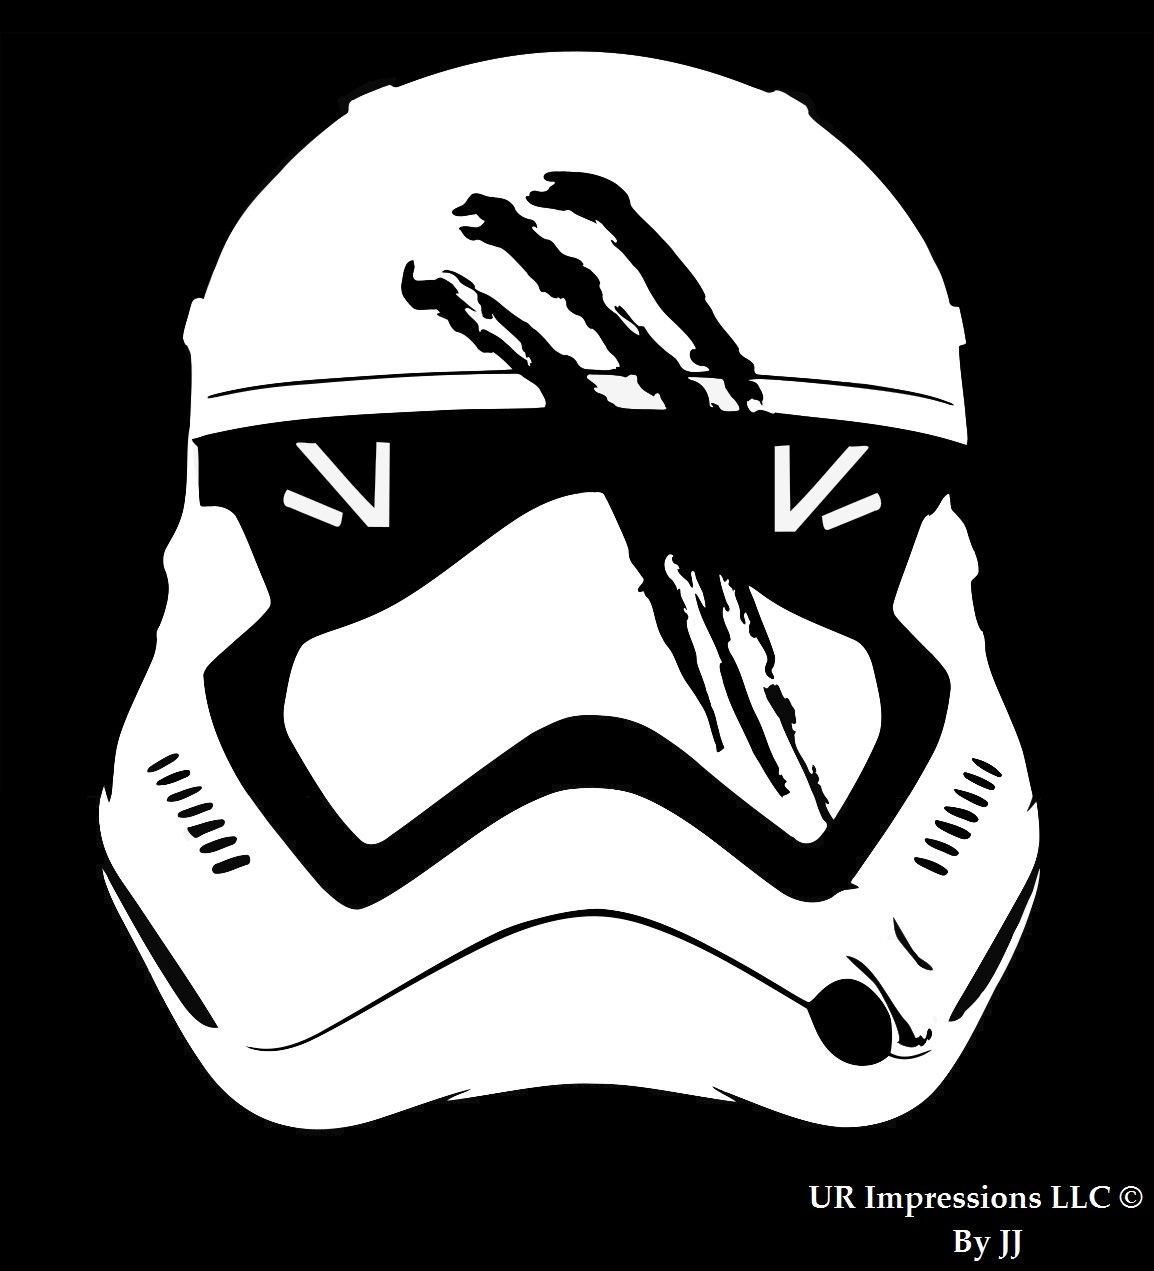 Storm Trooper Finn 's Blood SmearedヘルメットStar Wars Inspiredデカールビニールsticker|cars Trucks壁ノートパソコンtablet|white|5.5 in|jjuri003   B0762CMDWW